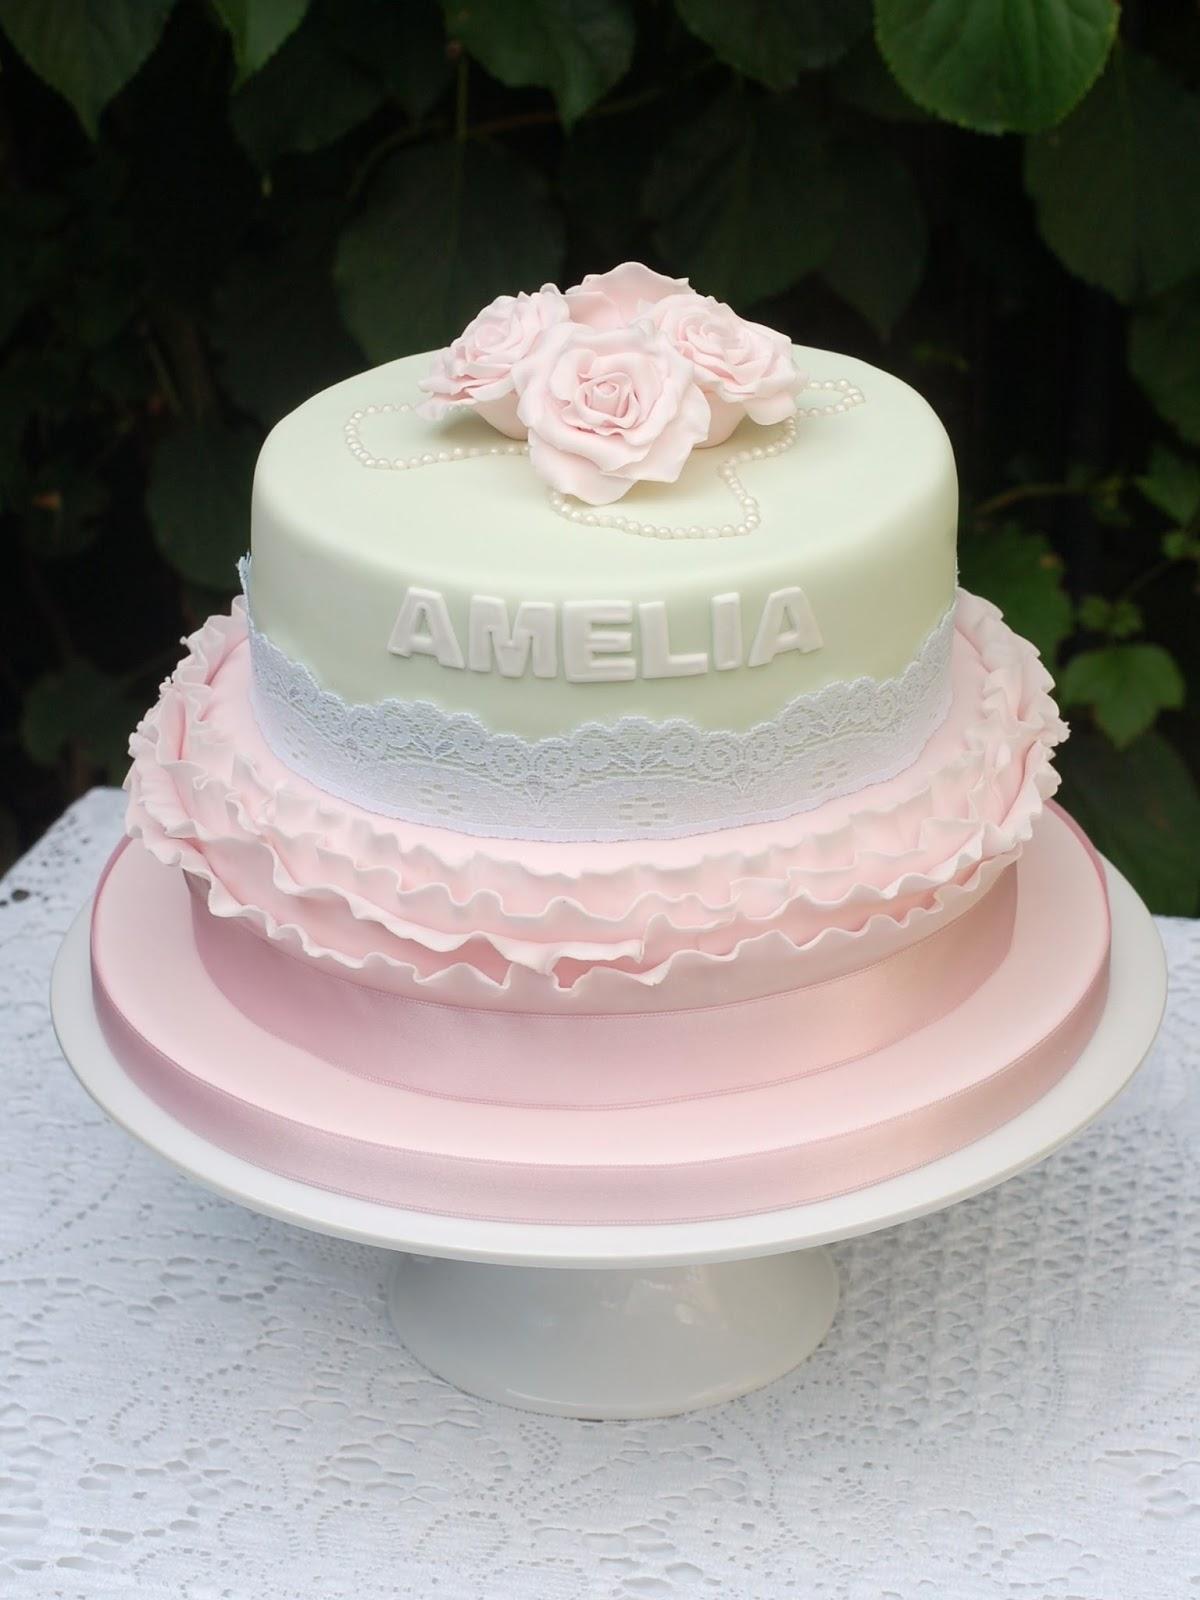 Vanilla Frost: Vintage Style Birthday Cake